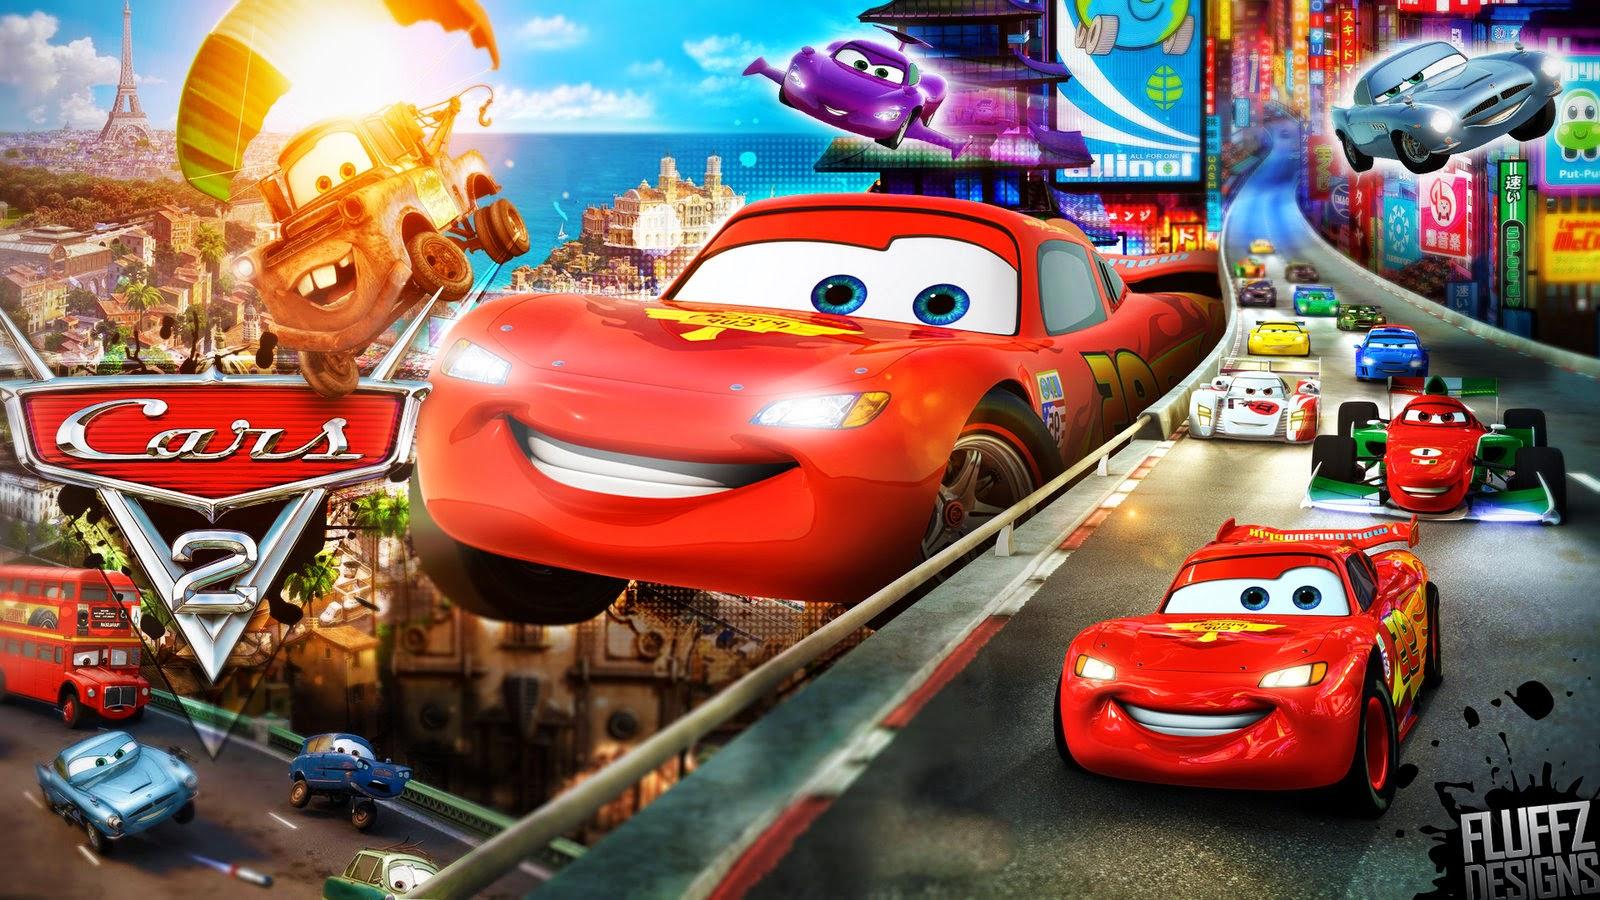 Disney's Cars 2 - Wallpaper